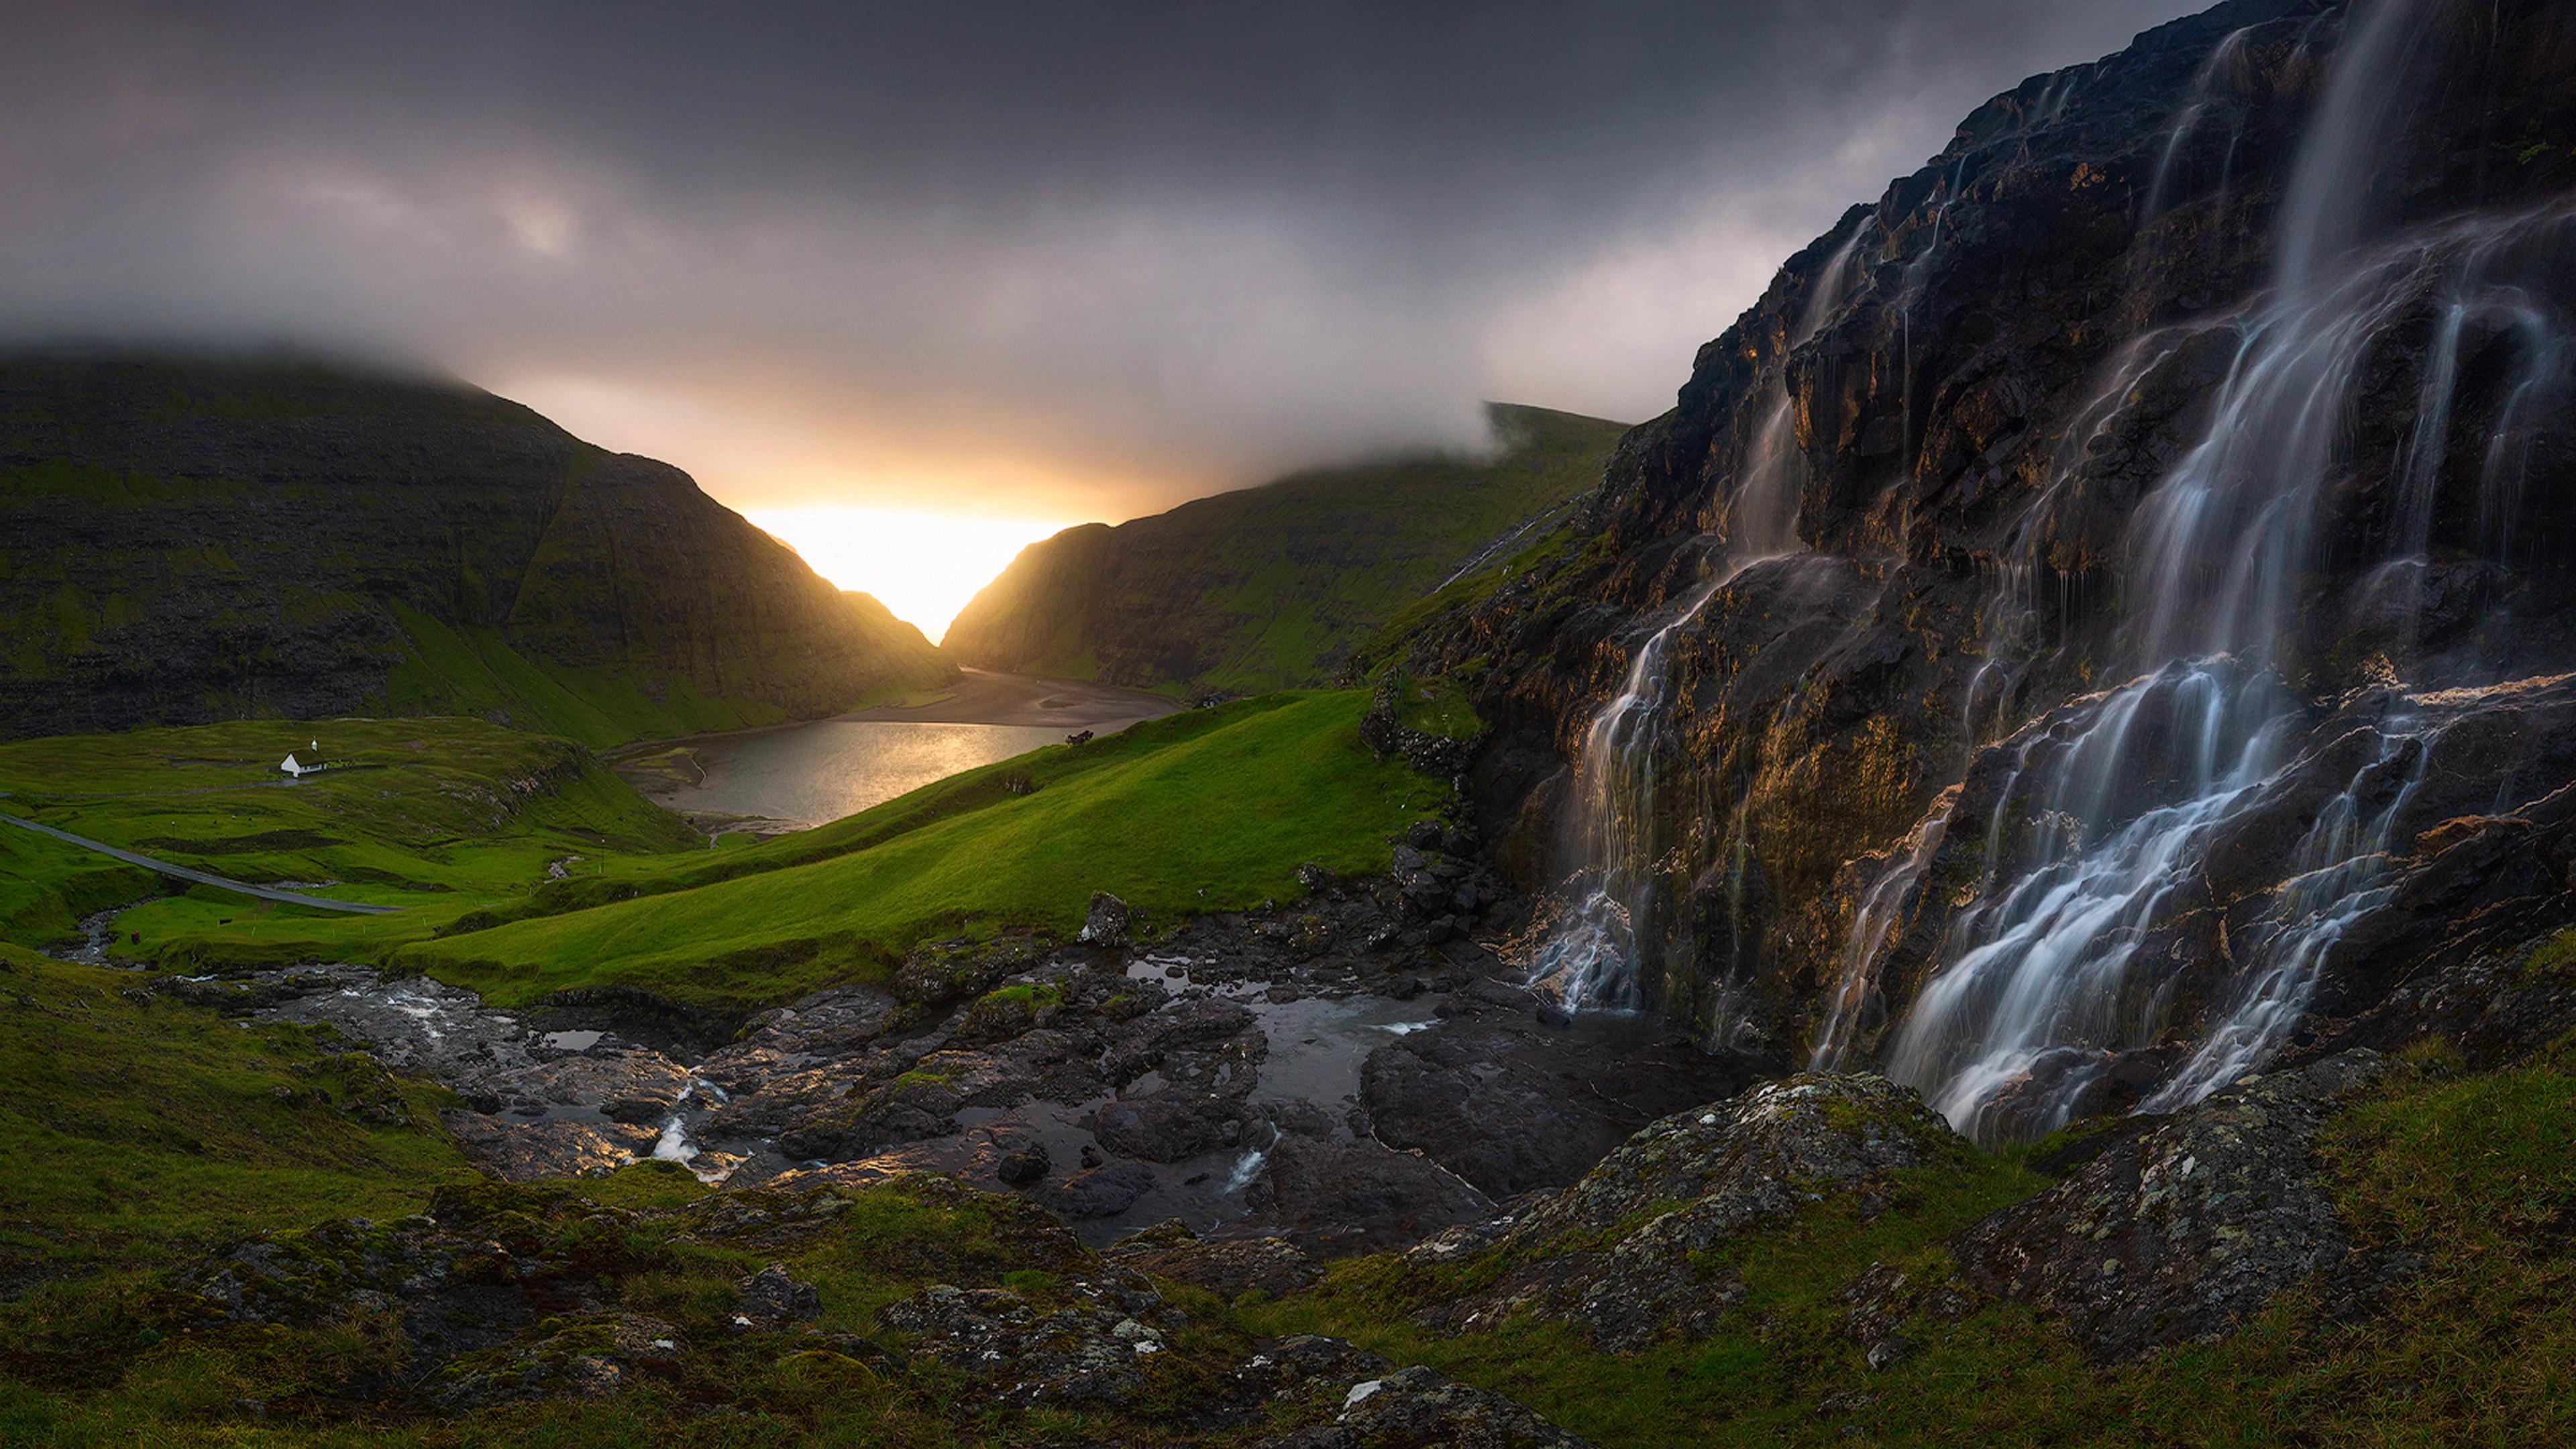 Falls Hd Wallpaper Free Download Faroe Islands Waterfall At Sunset Island Country Panorama